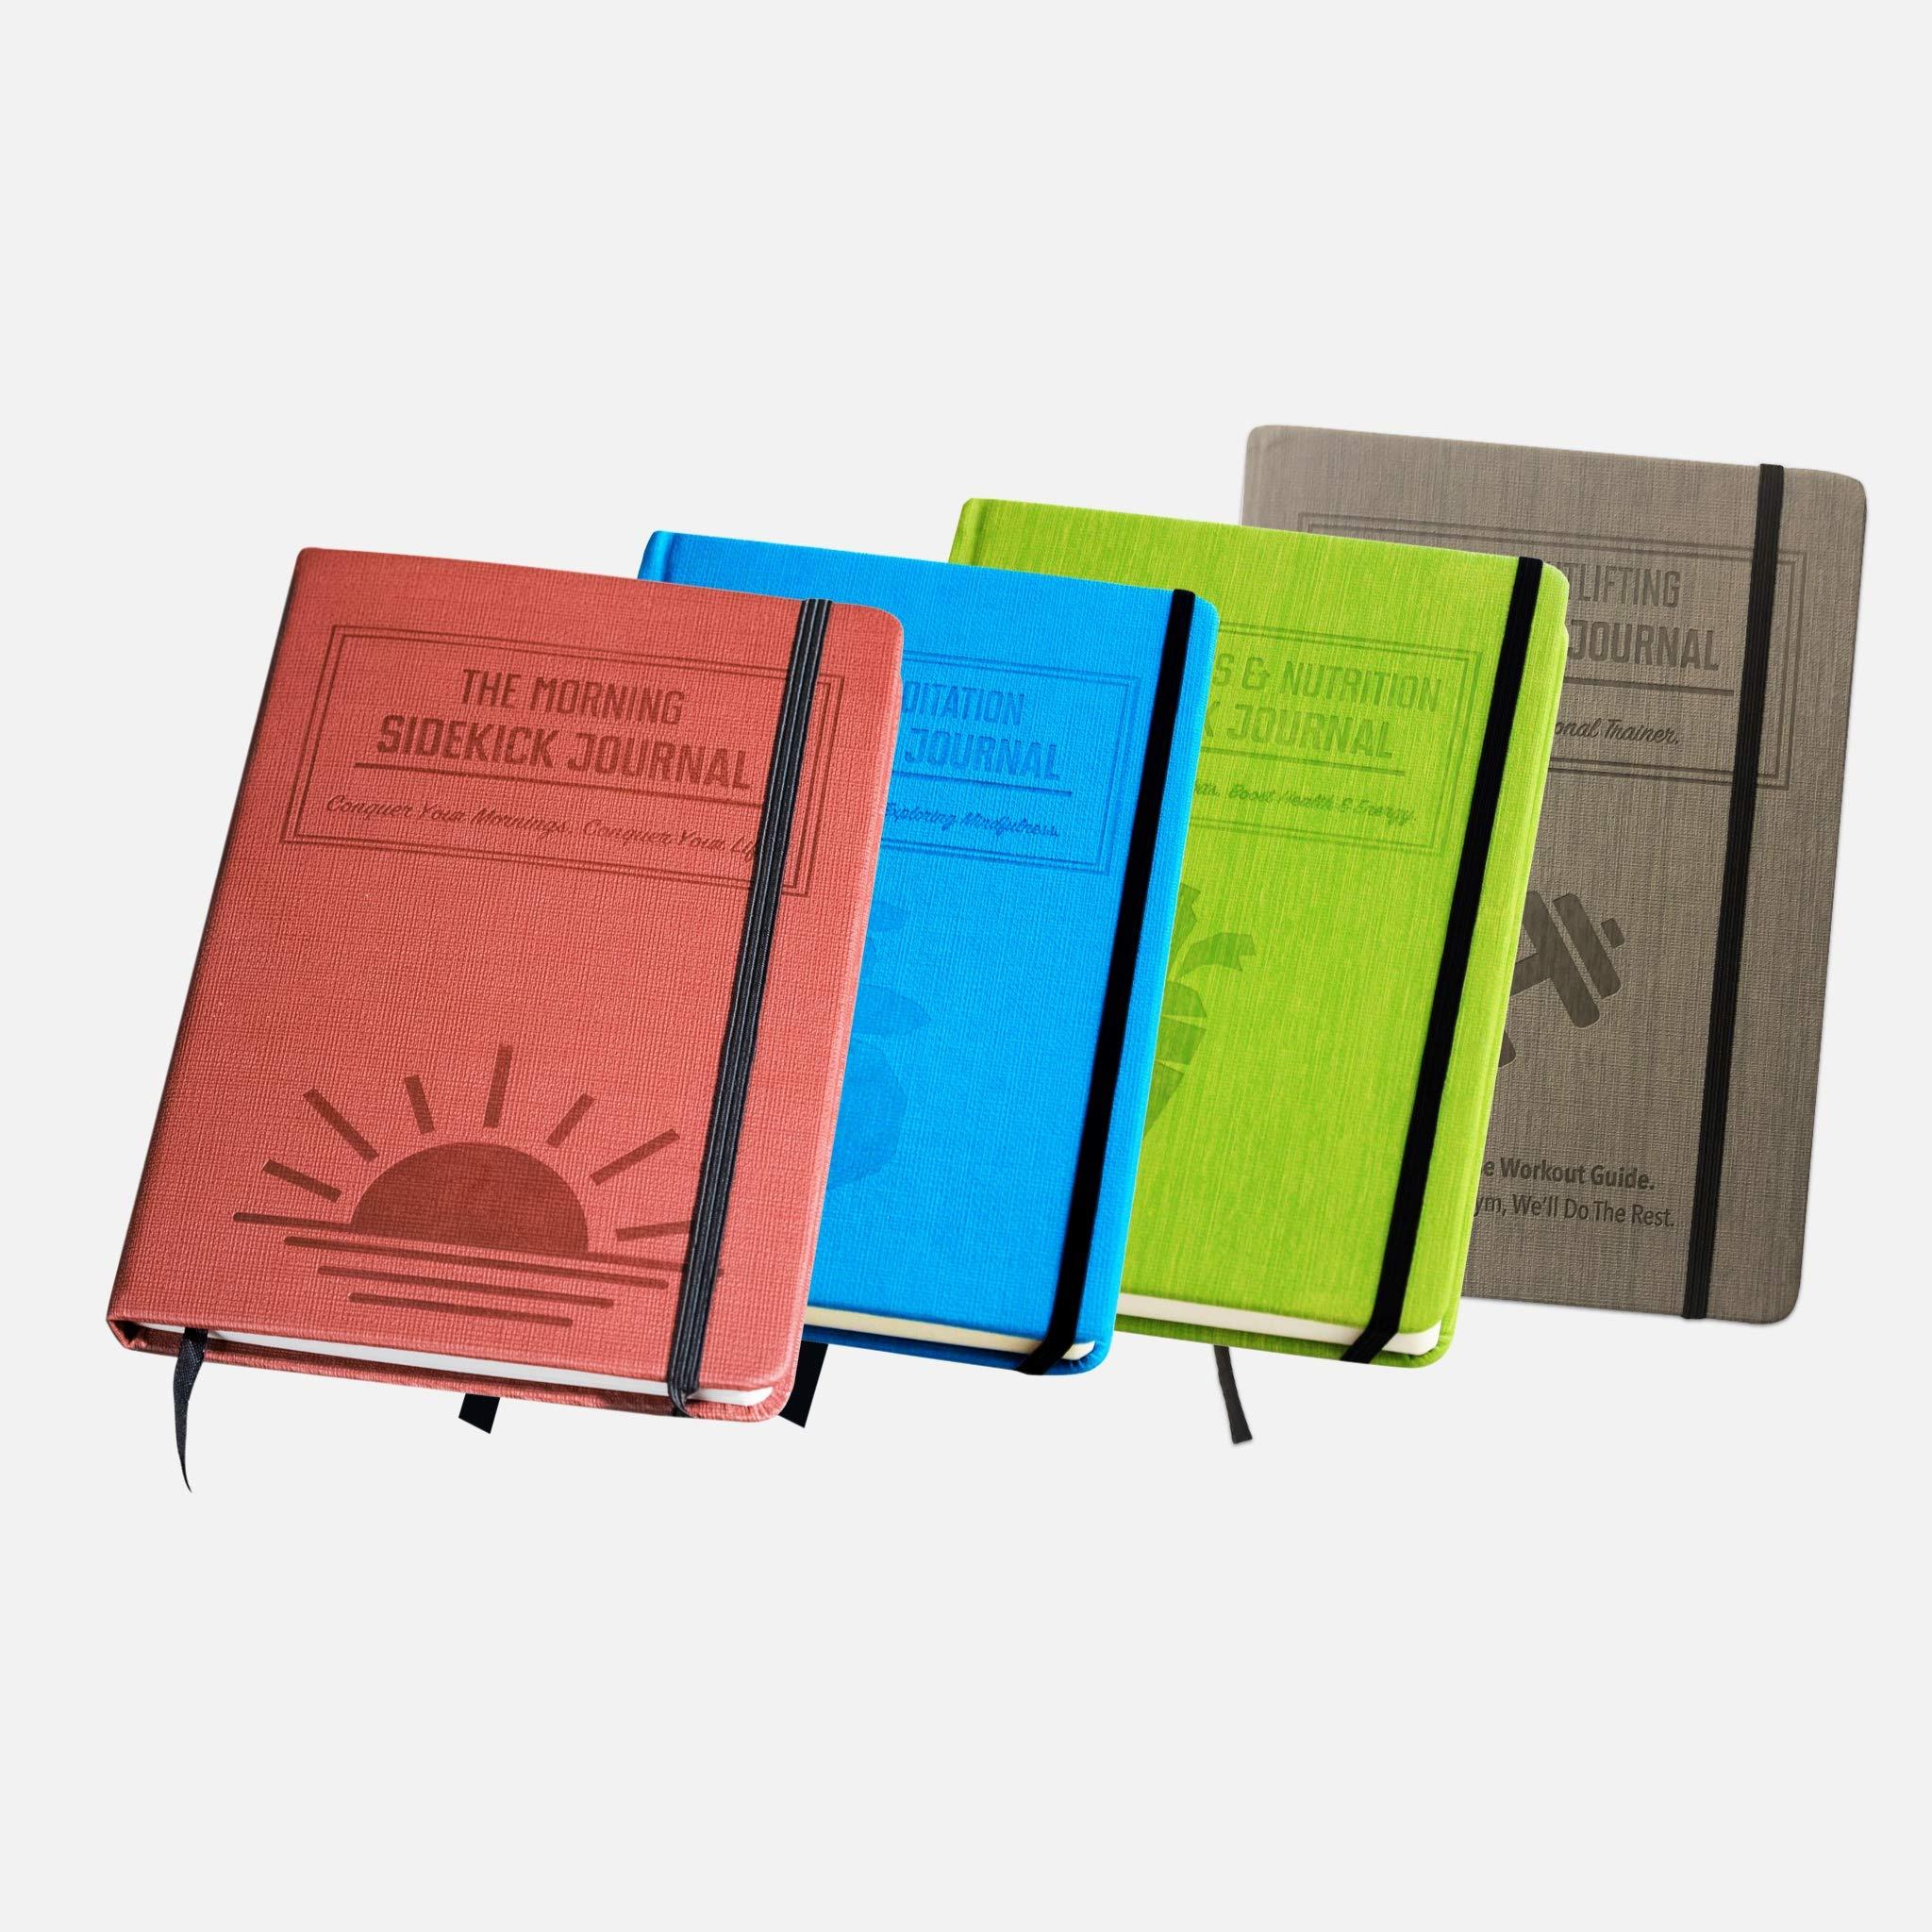 Habit Nest Bundle - 1 Gray Weightlifting Gym Buddy Journal,1x Red Morning Sidekick Journal, 1x Green Fat Loss & Nutrition Sidekick Journal, and 1x Blue Meditation Sidekick Journal by Habit Nest